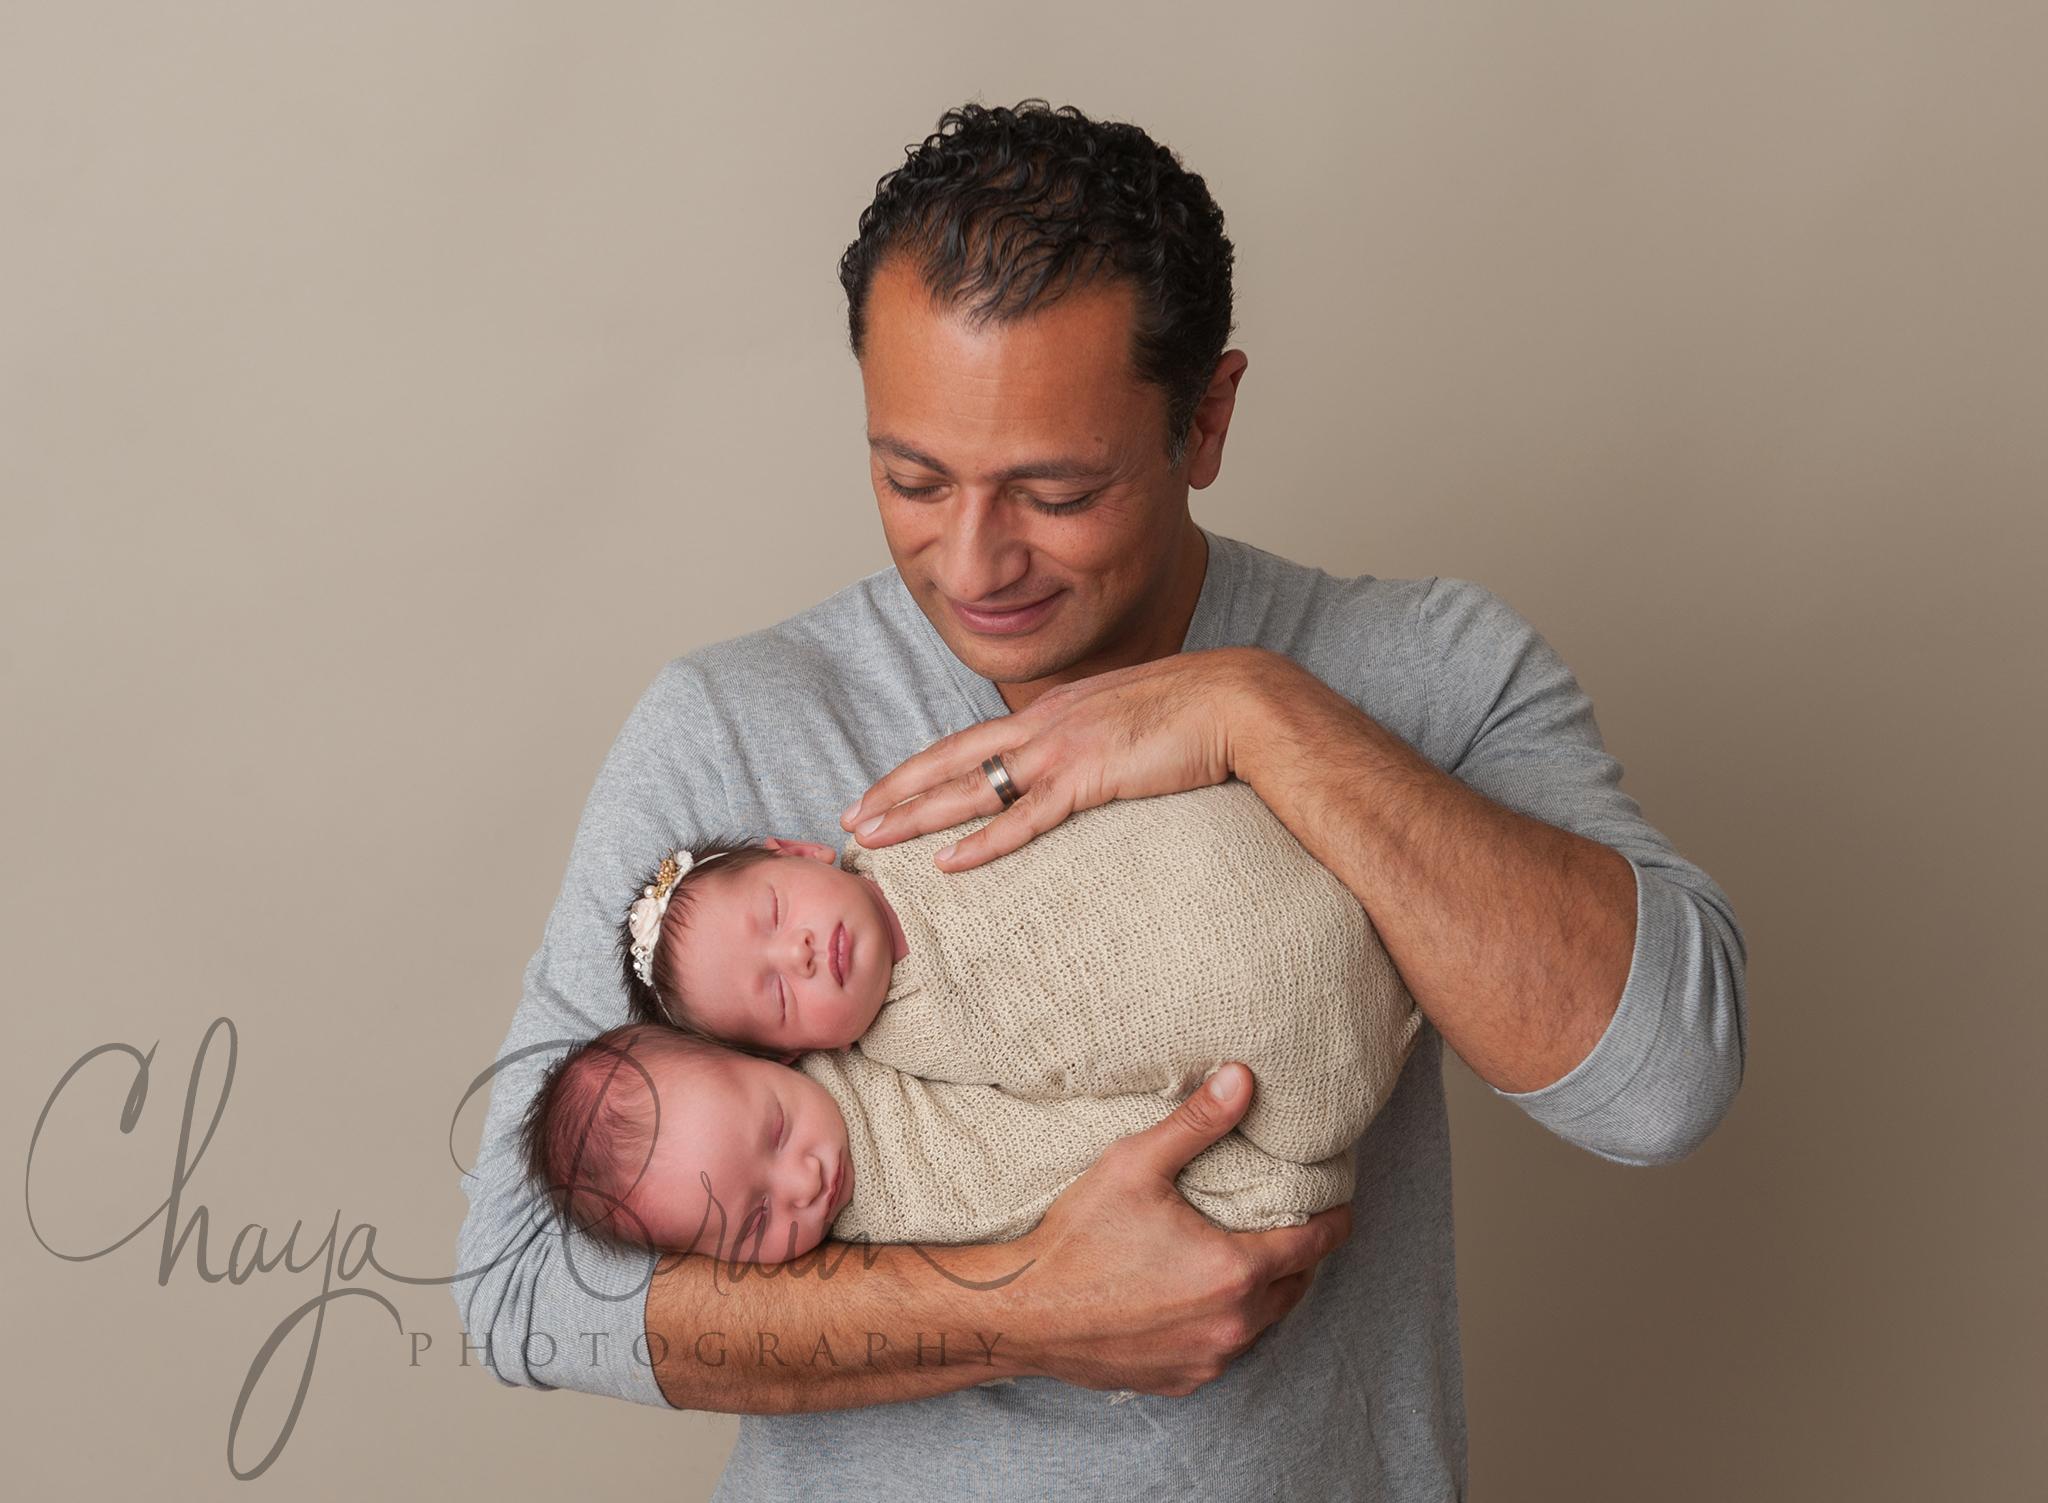 Dad with newborn baby twins